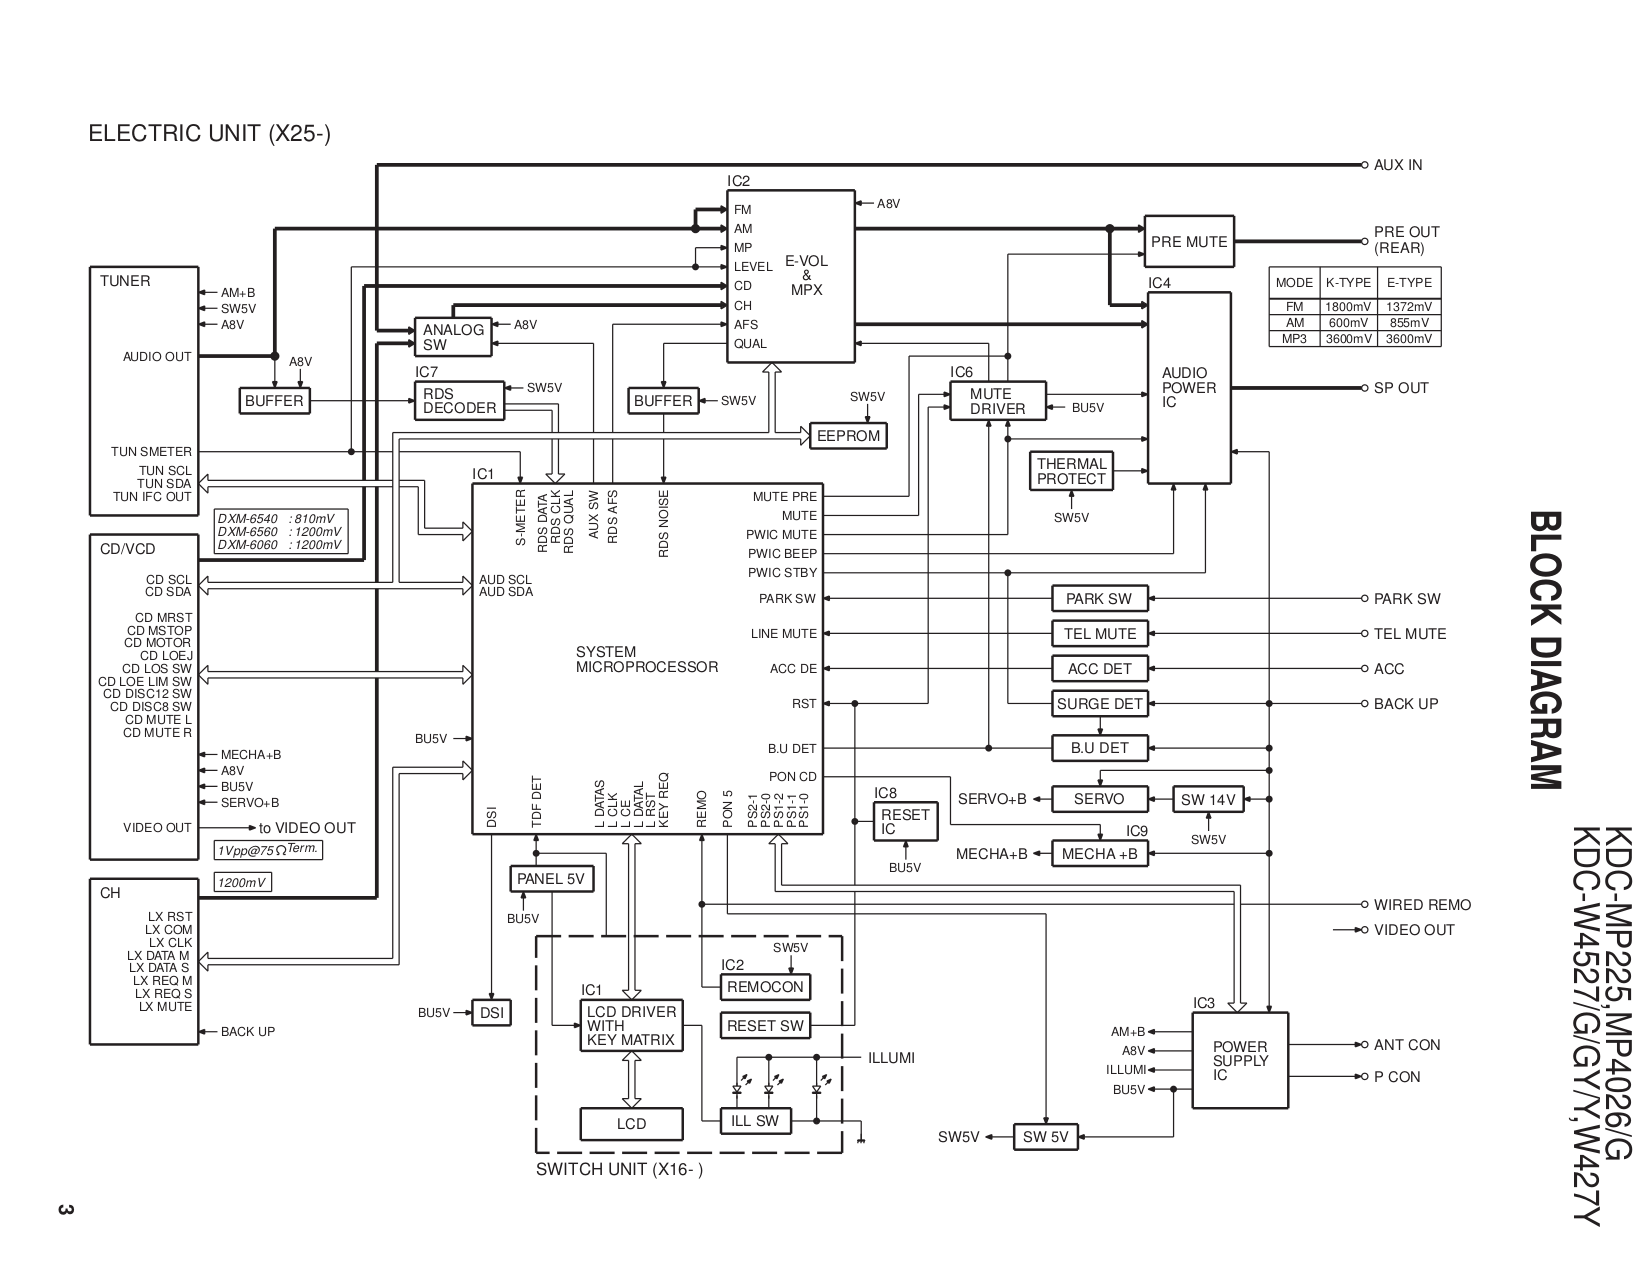 Kenwood kdc-w427 схема подключения